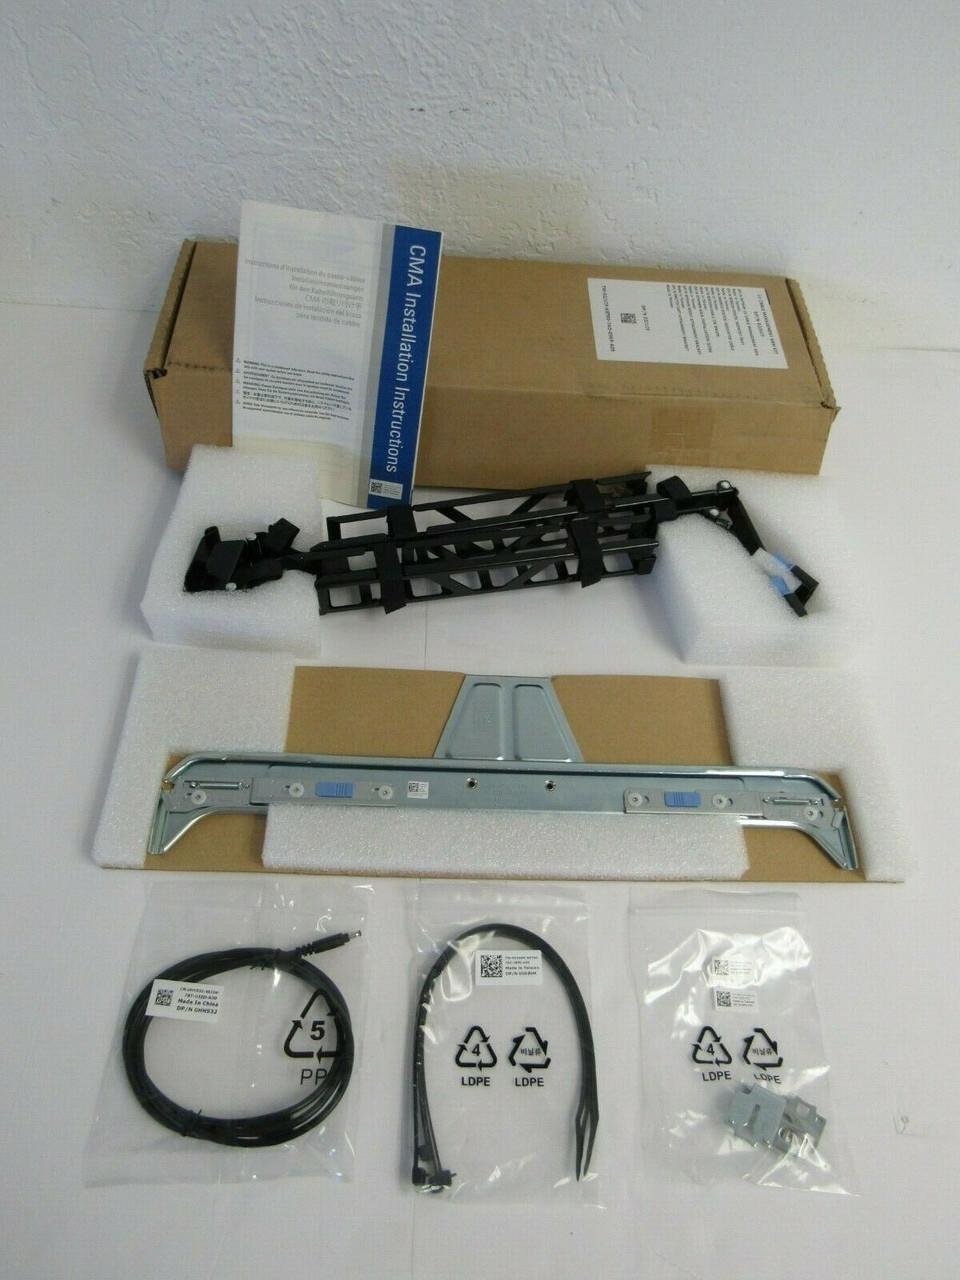 OEM Dell 1U Server Cable Management Arm Kit 02J1CF PowerEdge R620 R420 R320